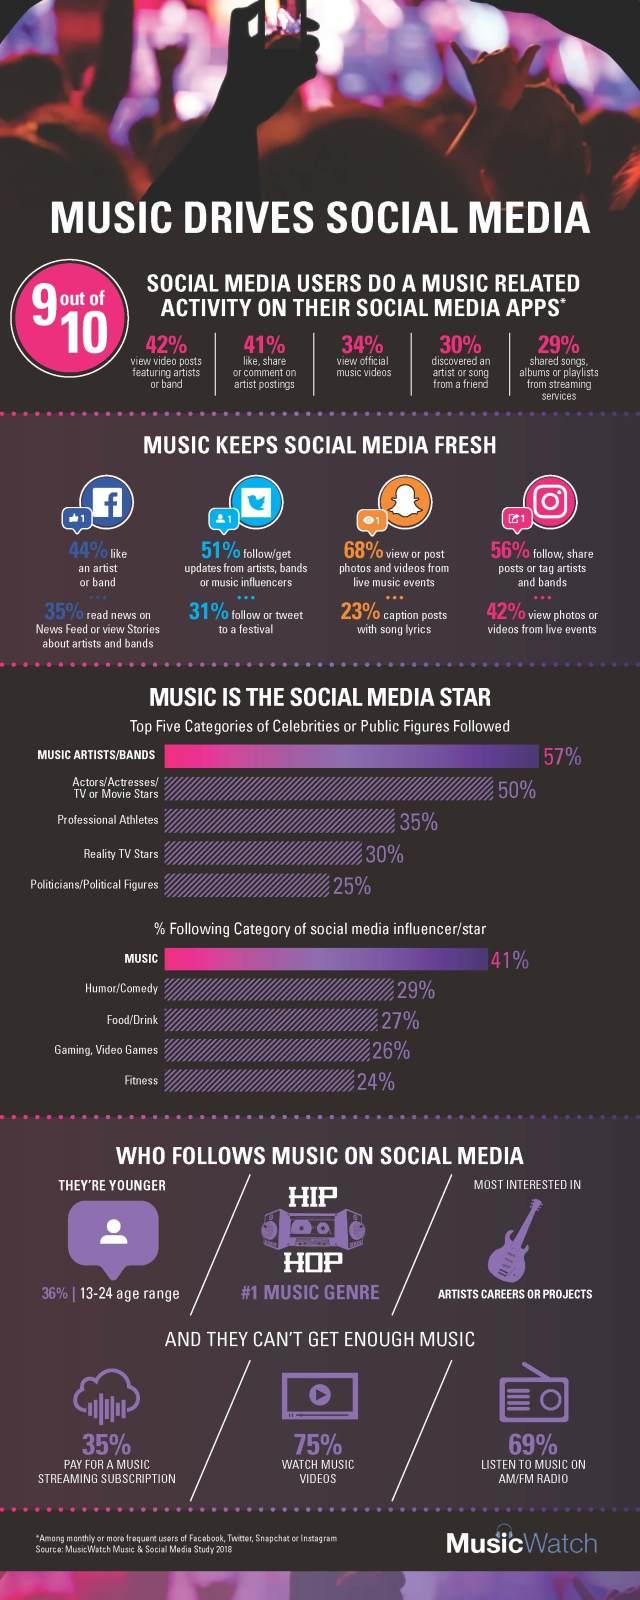 Music Is Scoring Big on Social Media